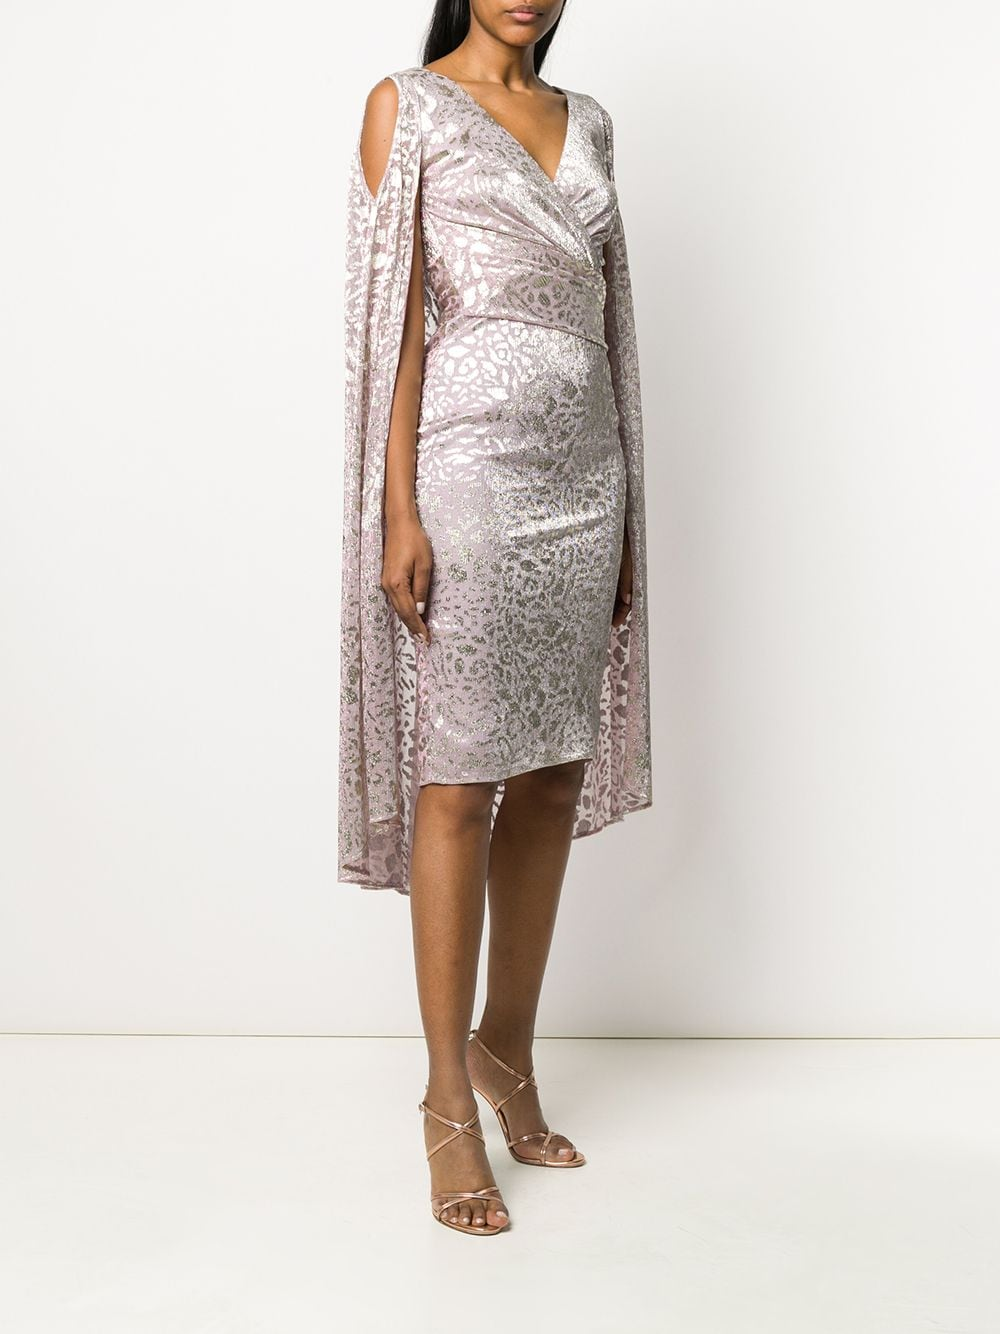 Pink metallic dress from featuring metallic threading TALBOT RUNHOF |  | BORGENA1-FK55317